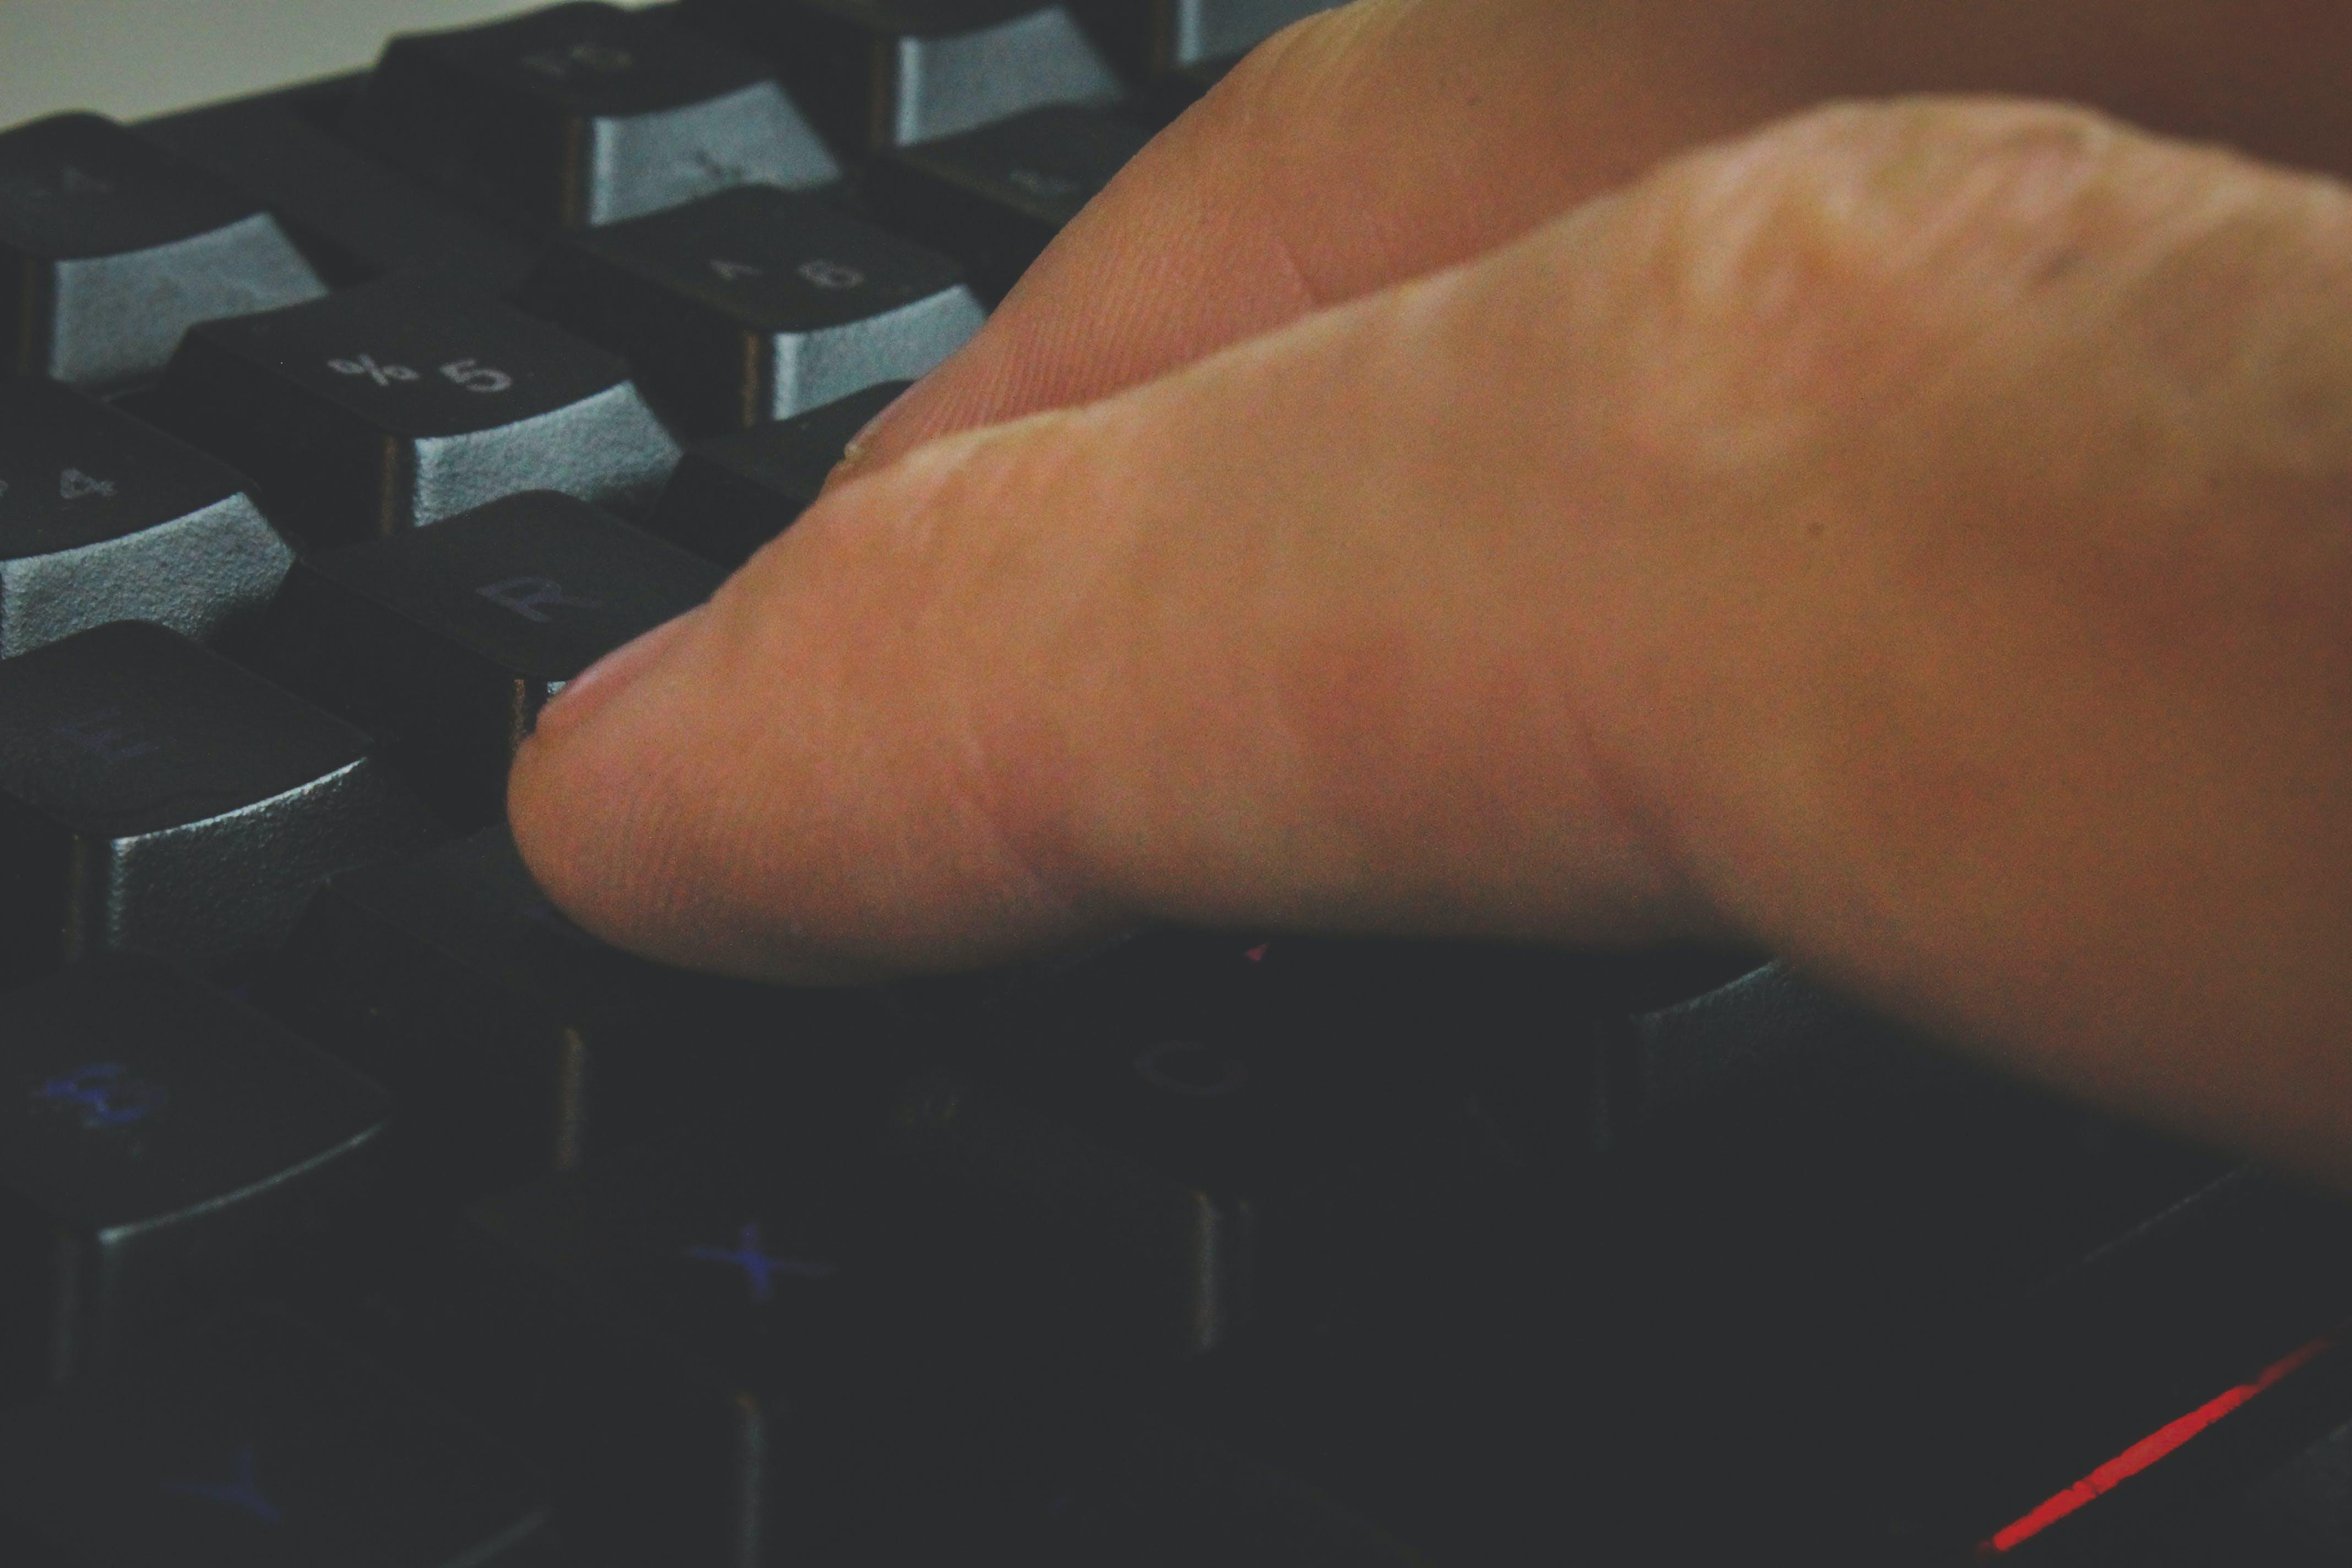 body, computer keyboard, hand